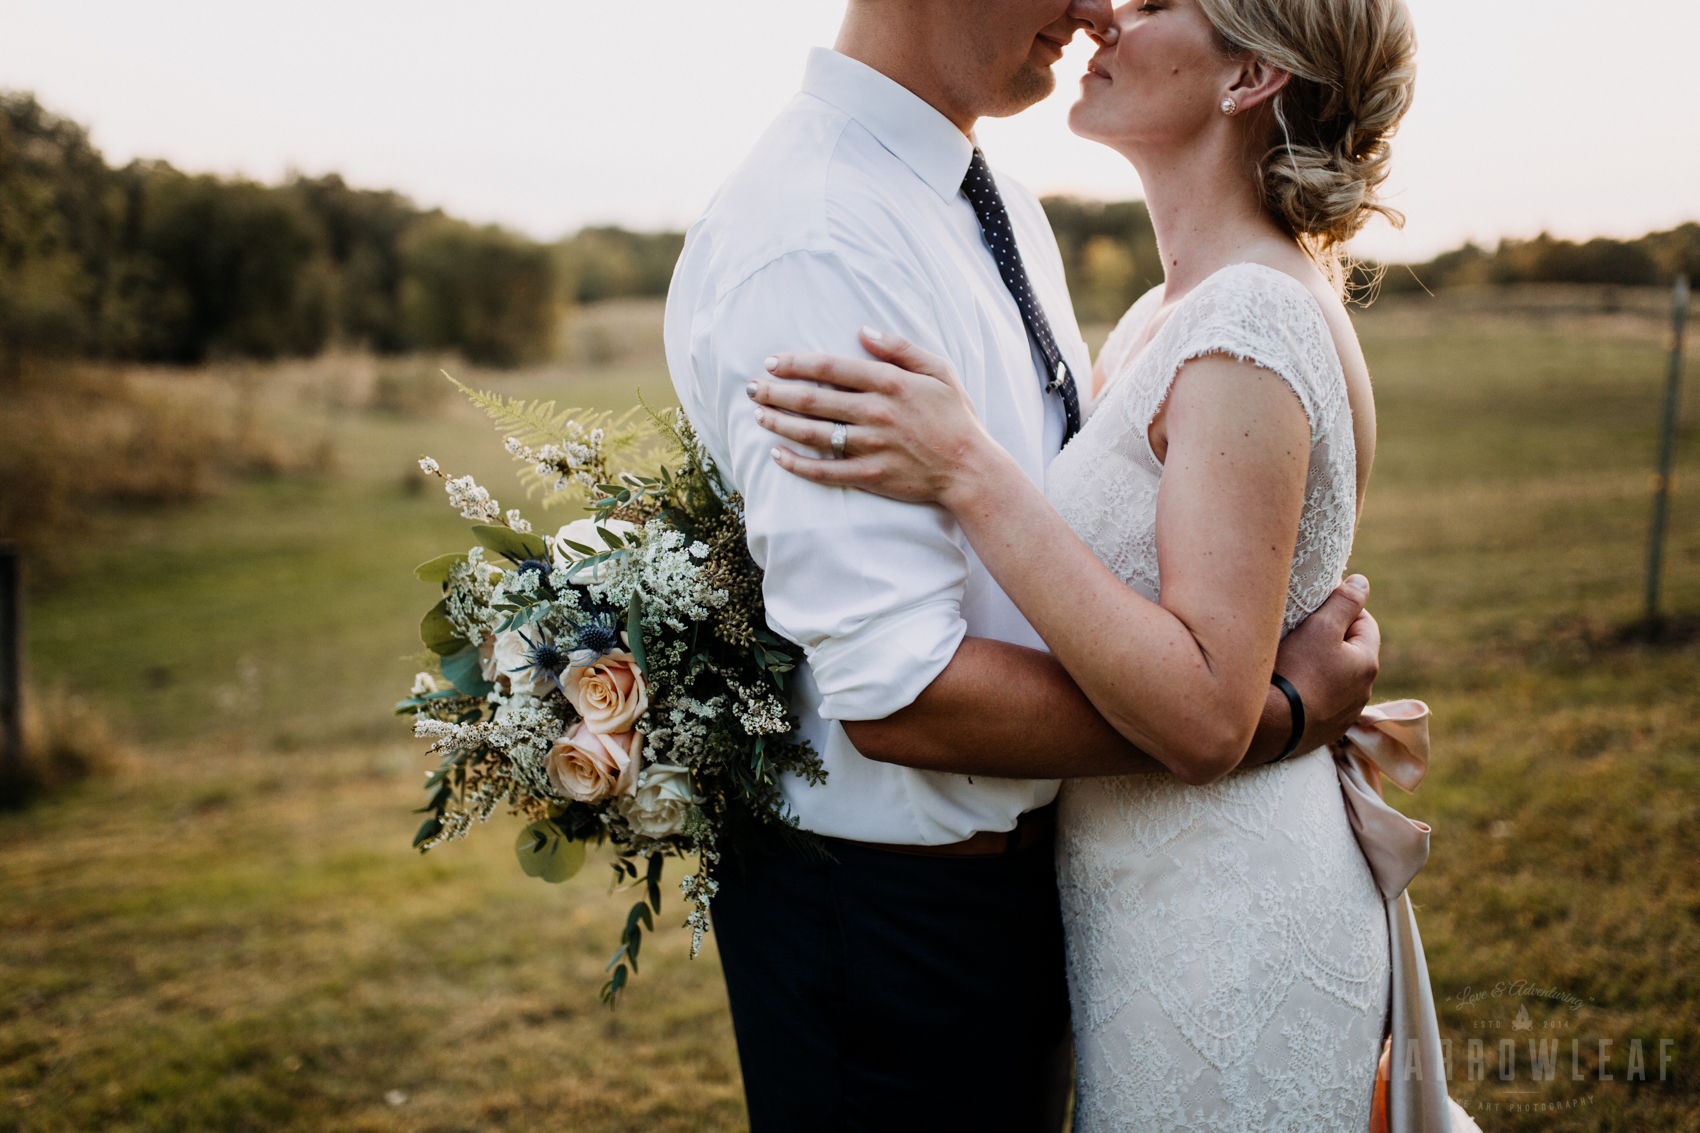 warm-romantic-sunset-bride-groom-photos-on-a-farm-in-south-haven-mn-41.jpg